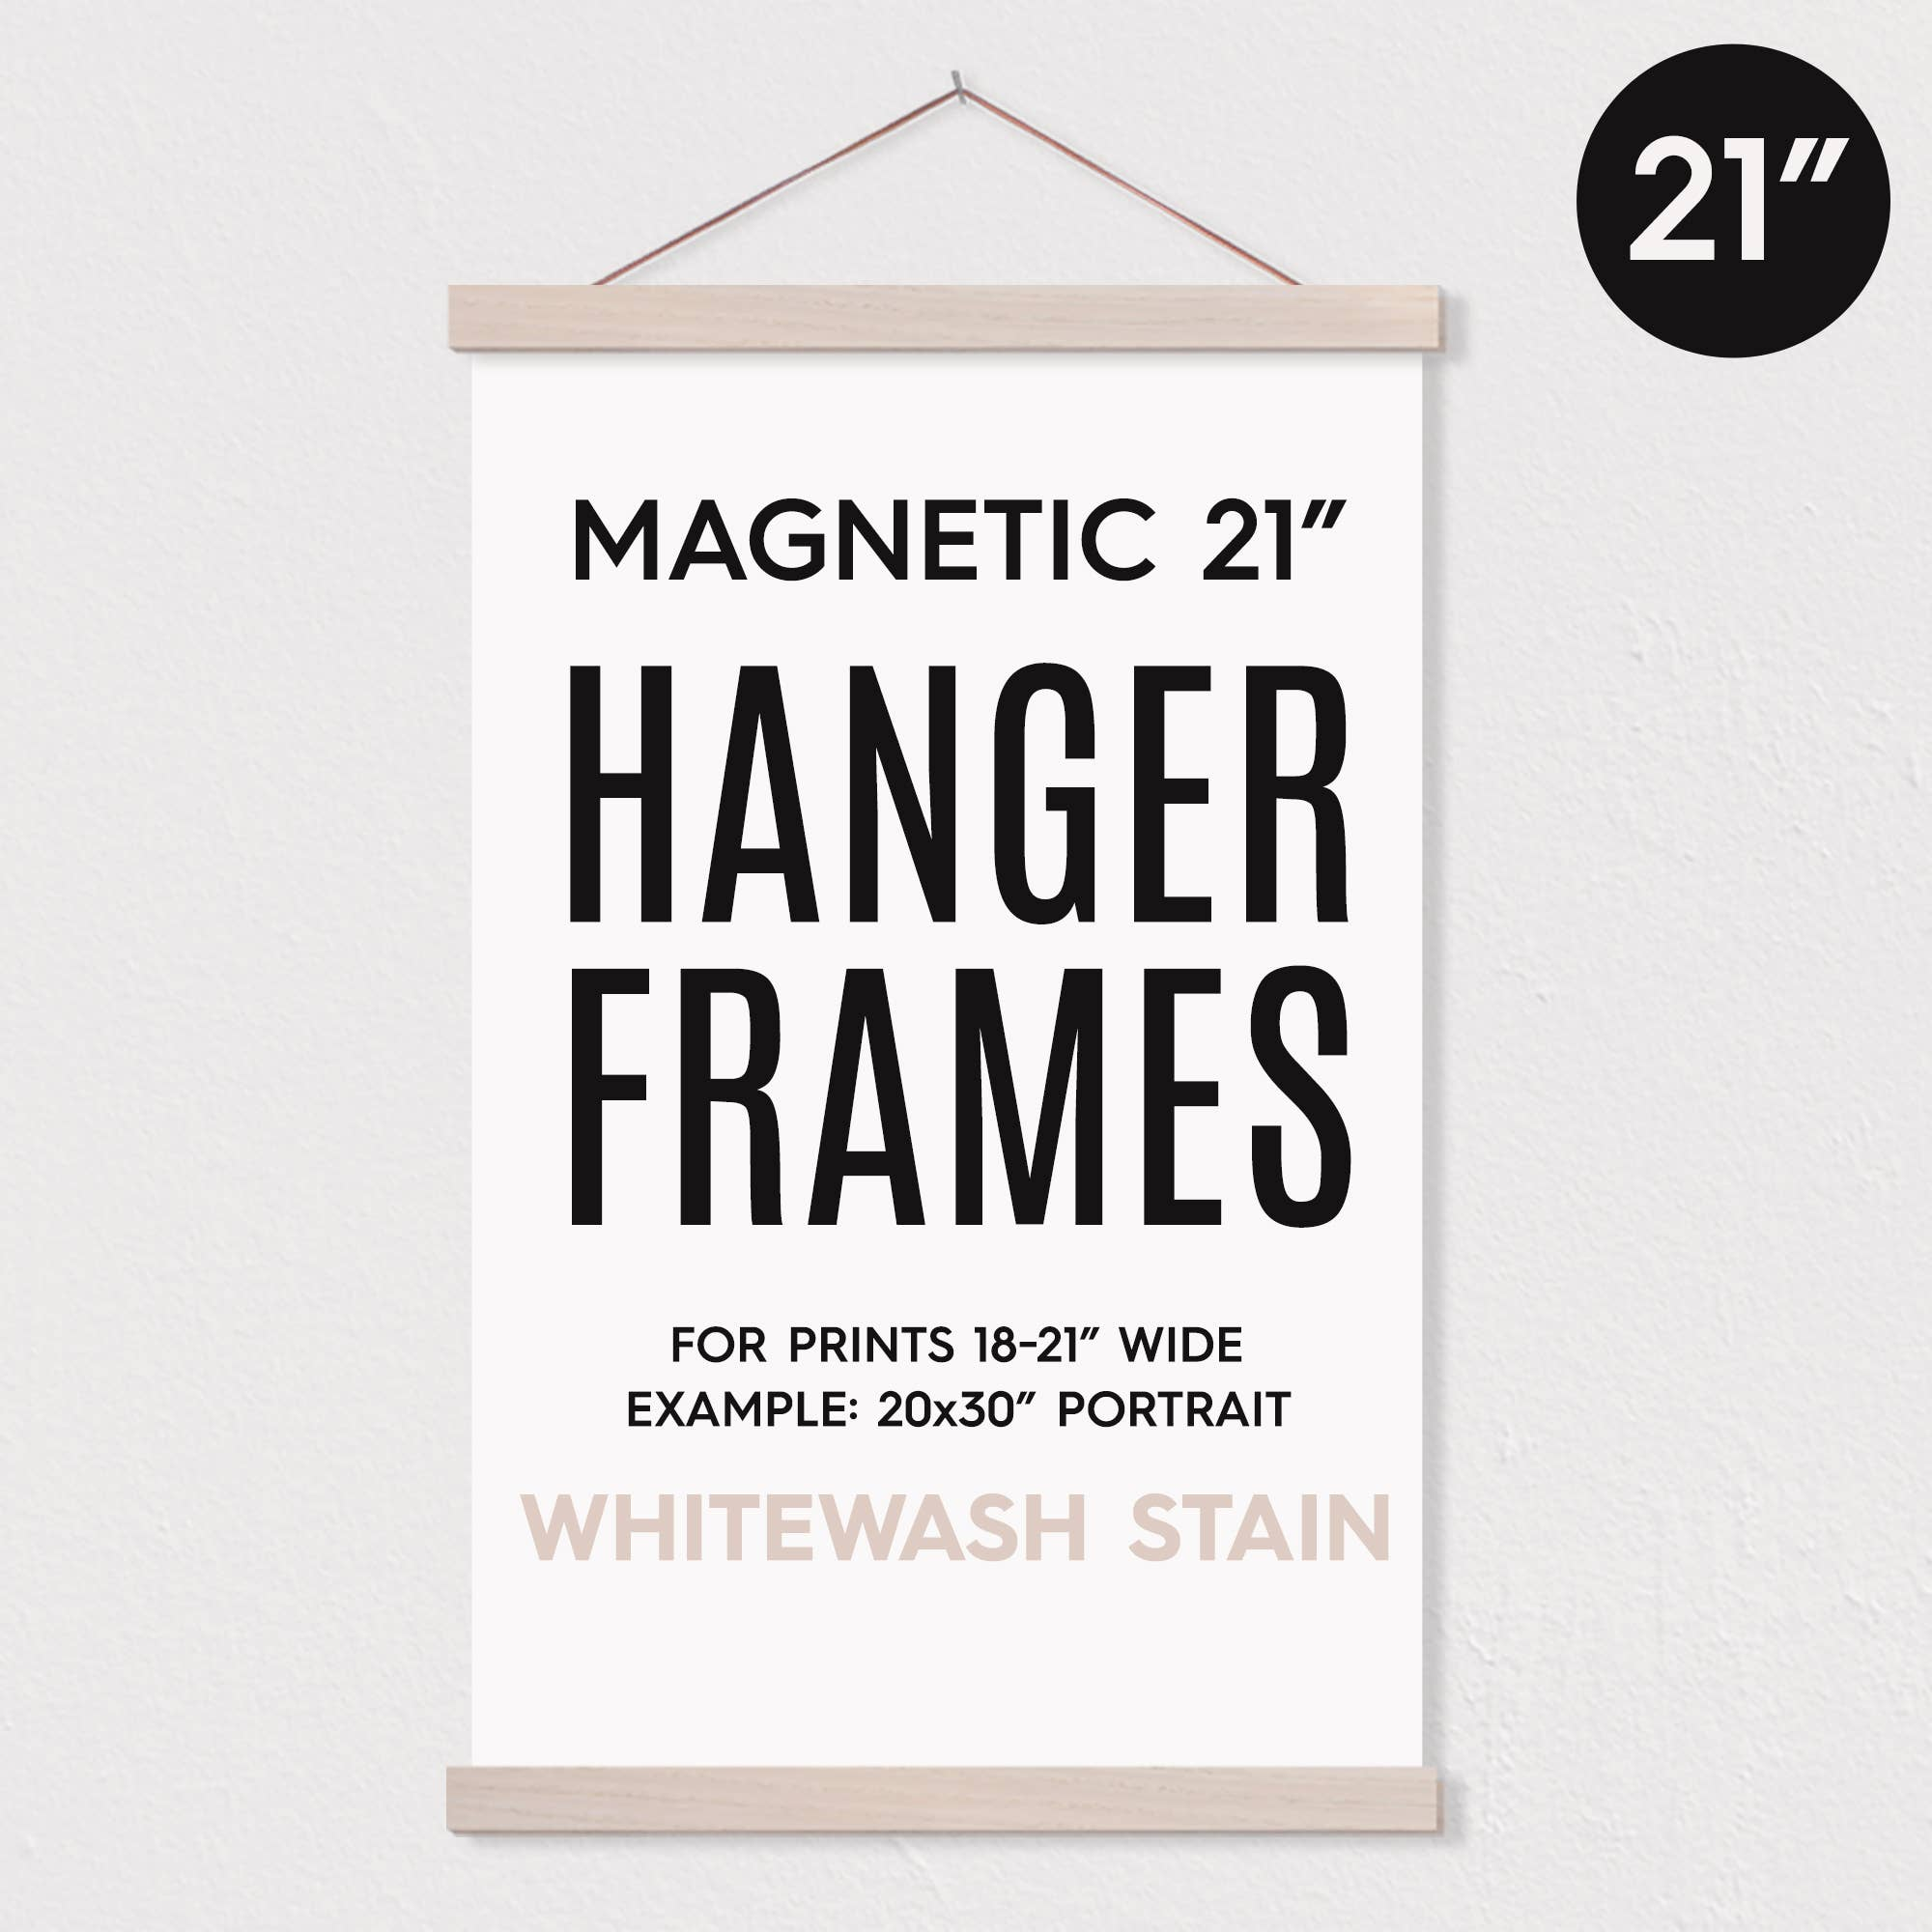 "21"" MAGNETIC Poster Hanger Frame™ for 20x30"" Portrait Print   Trada Marketplace"